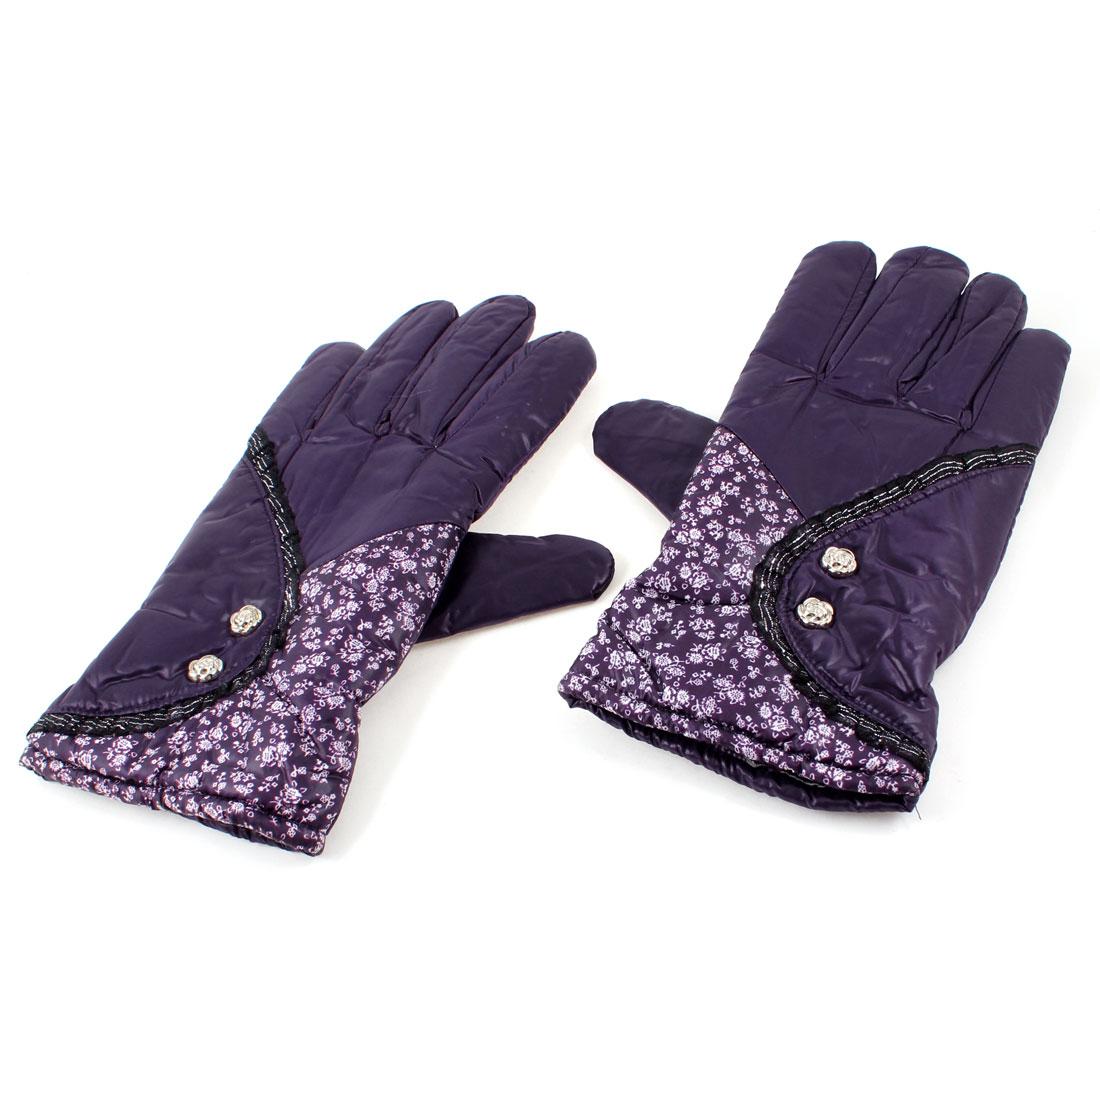 Cycling Windproof Fleece Lining Full Finger Warm Gloves Dark Purple Pair for Ladies